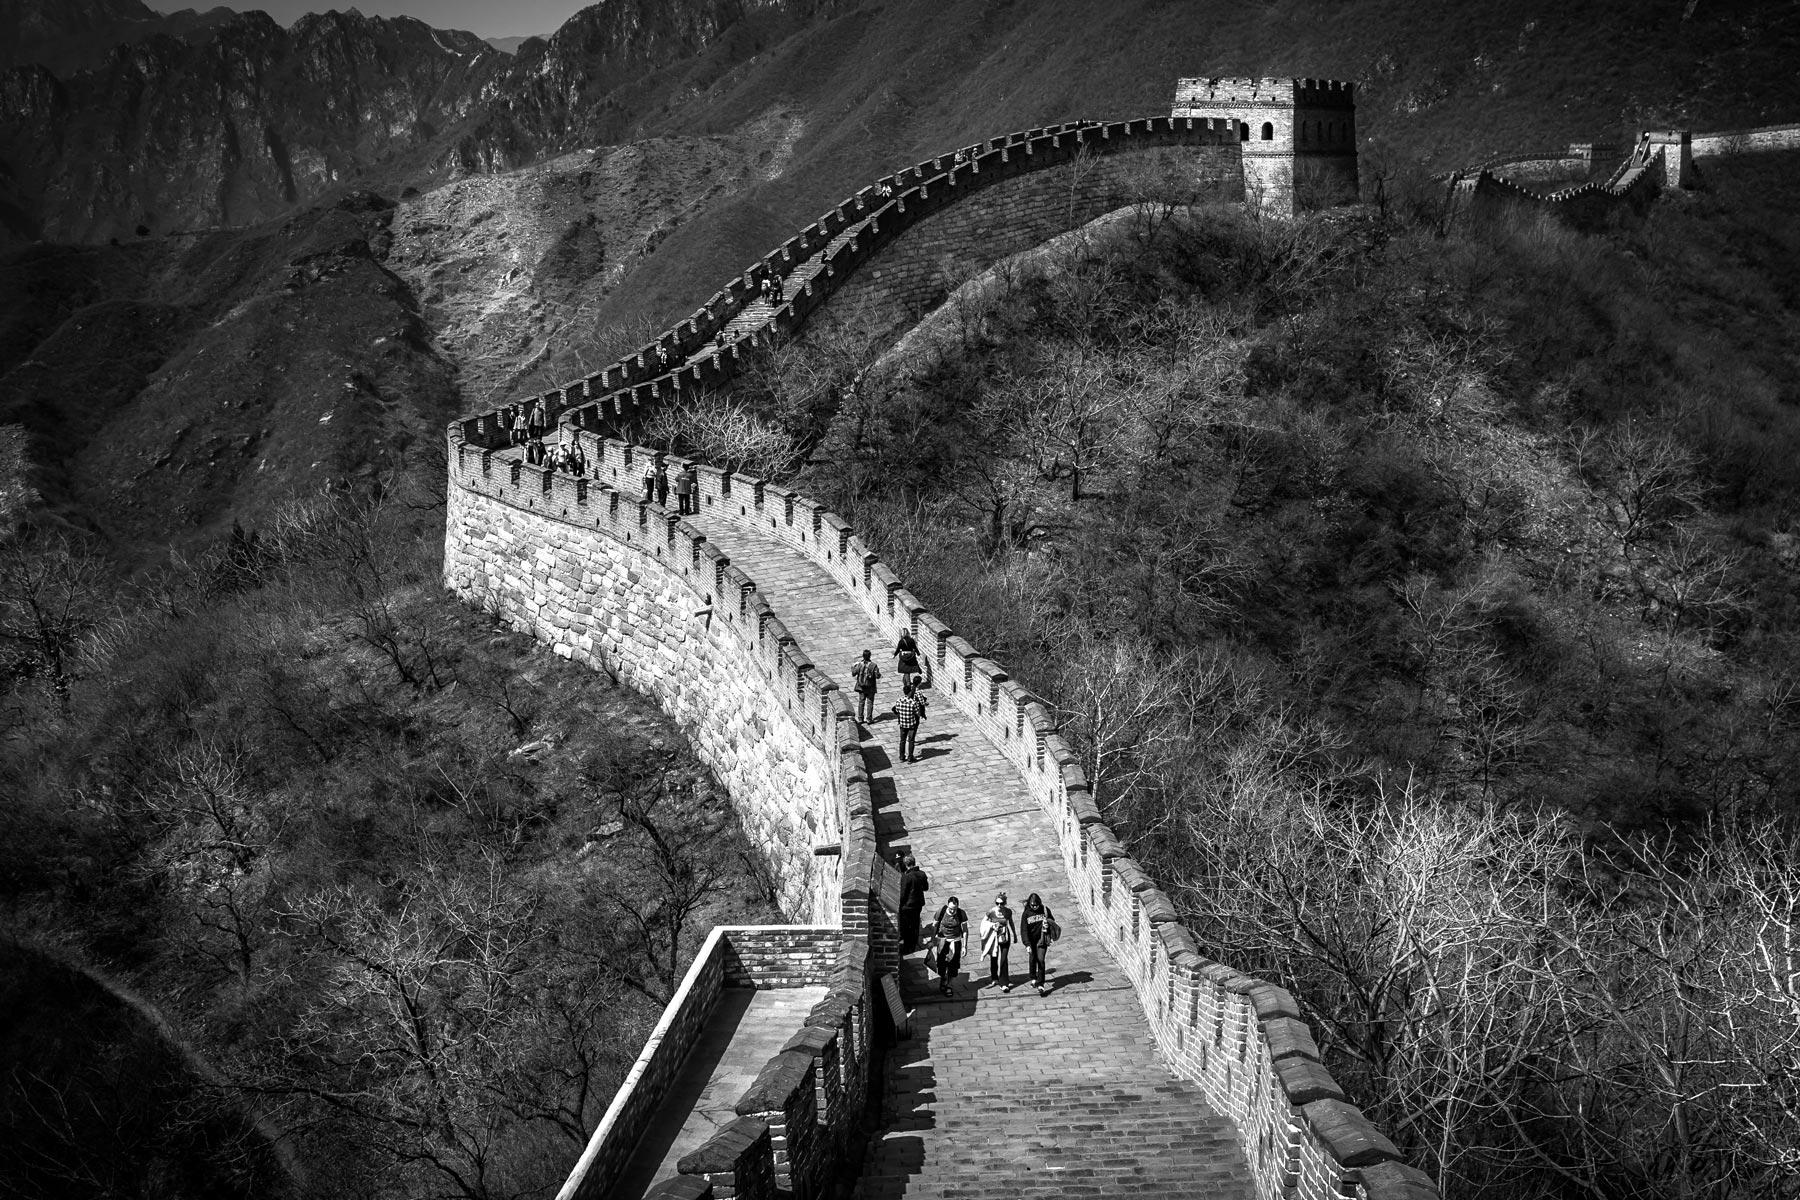 beijingchinawall-1.jpg